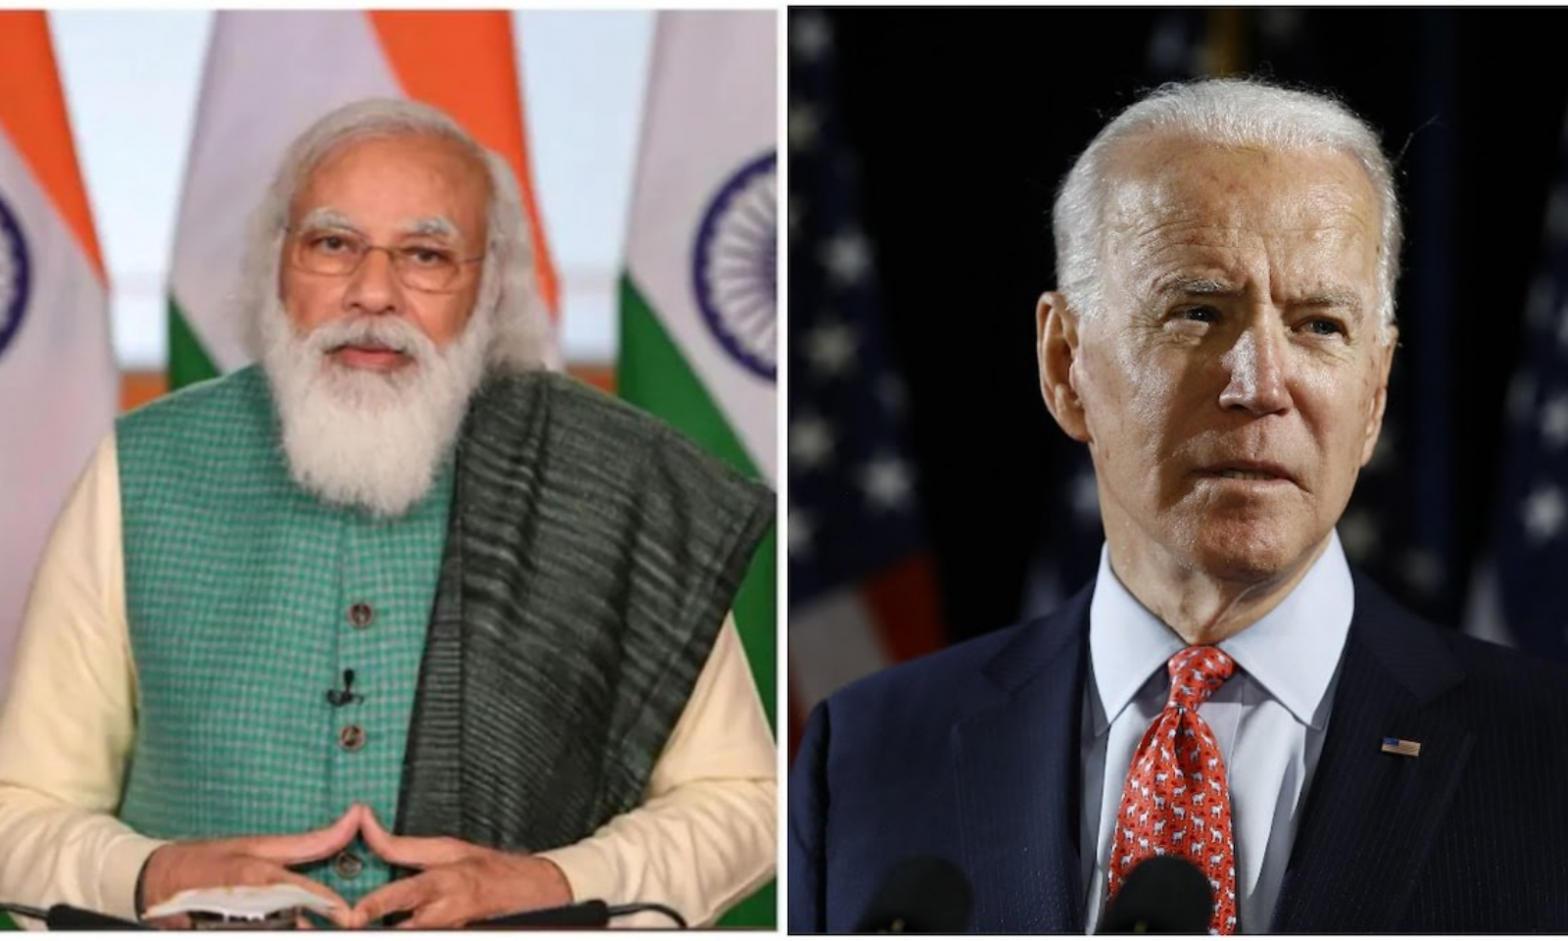 PM Modi Participates in Leaders' Summit on Climate | জলবায়ু সম্পর্কিত নেতাদের শীর্ষ সম্মেলনে প্রধানমন্ত্রী মোদি অংশ নিয়েছেন _40.1